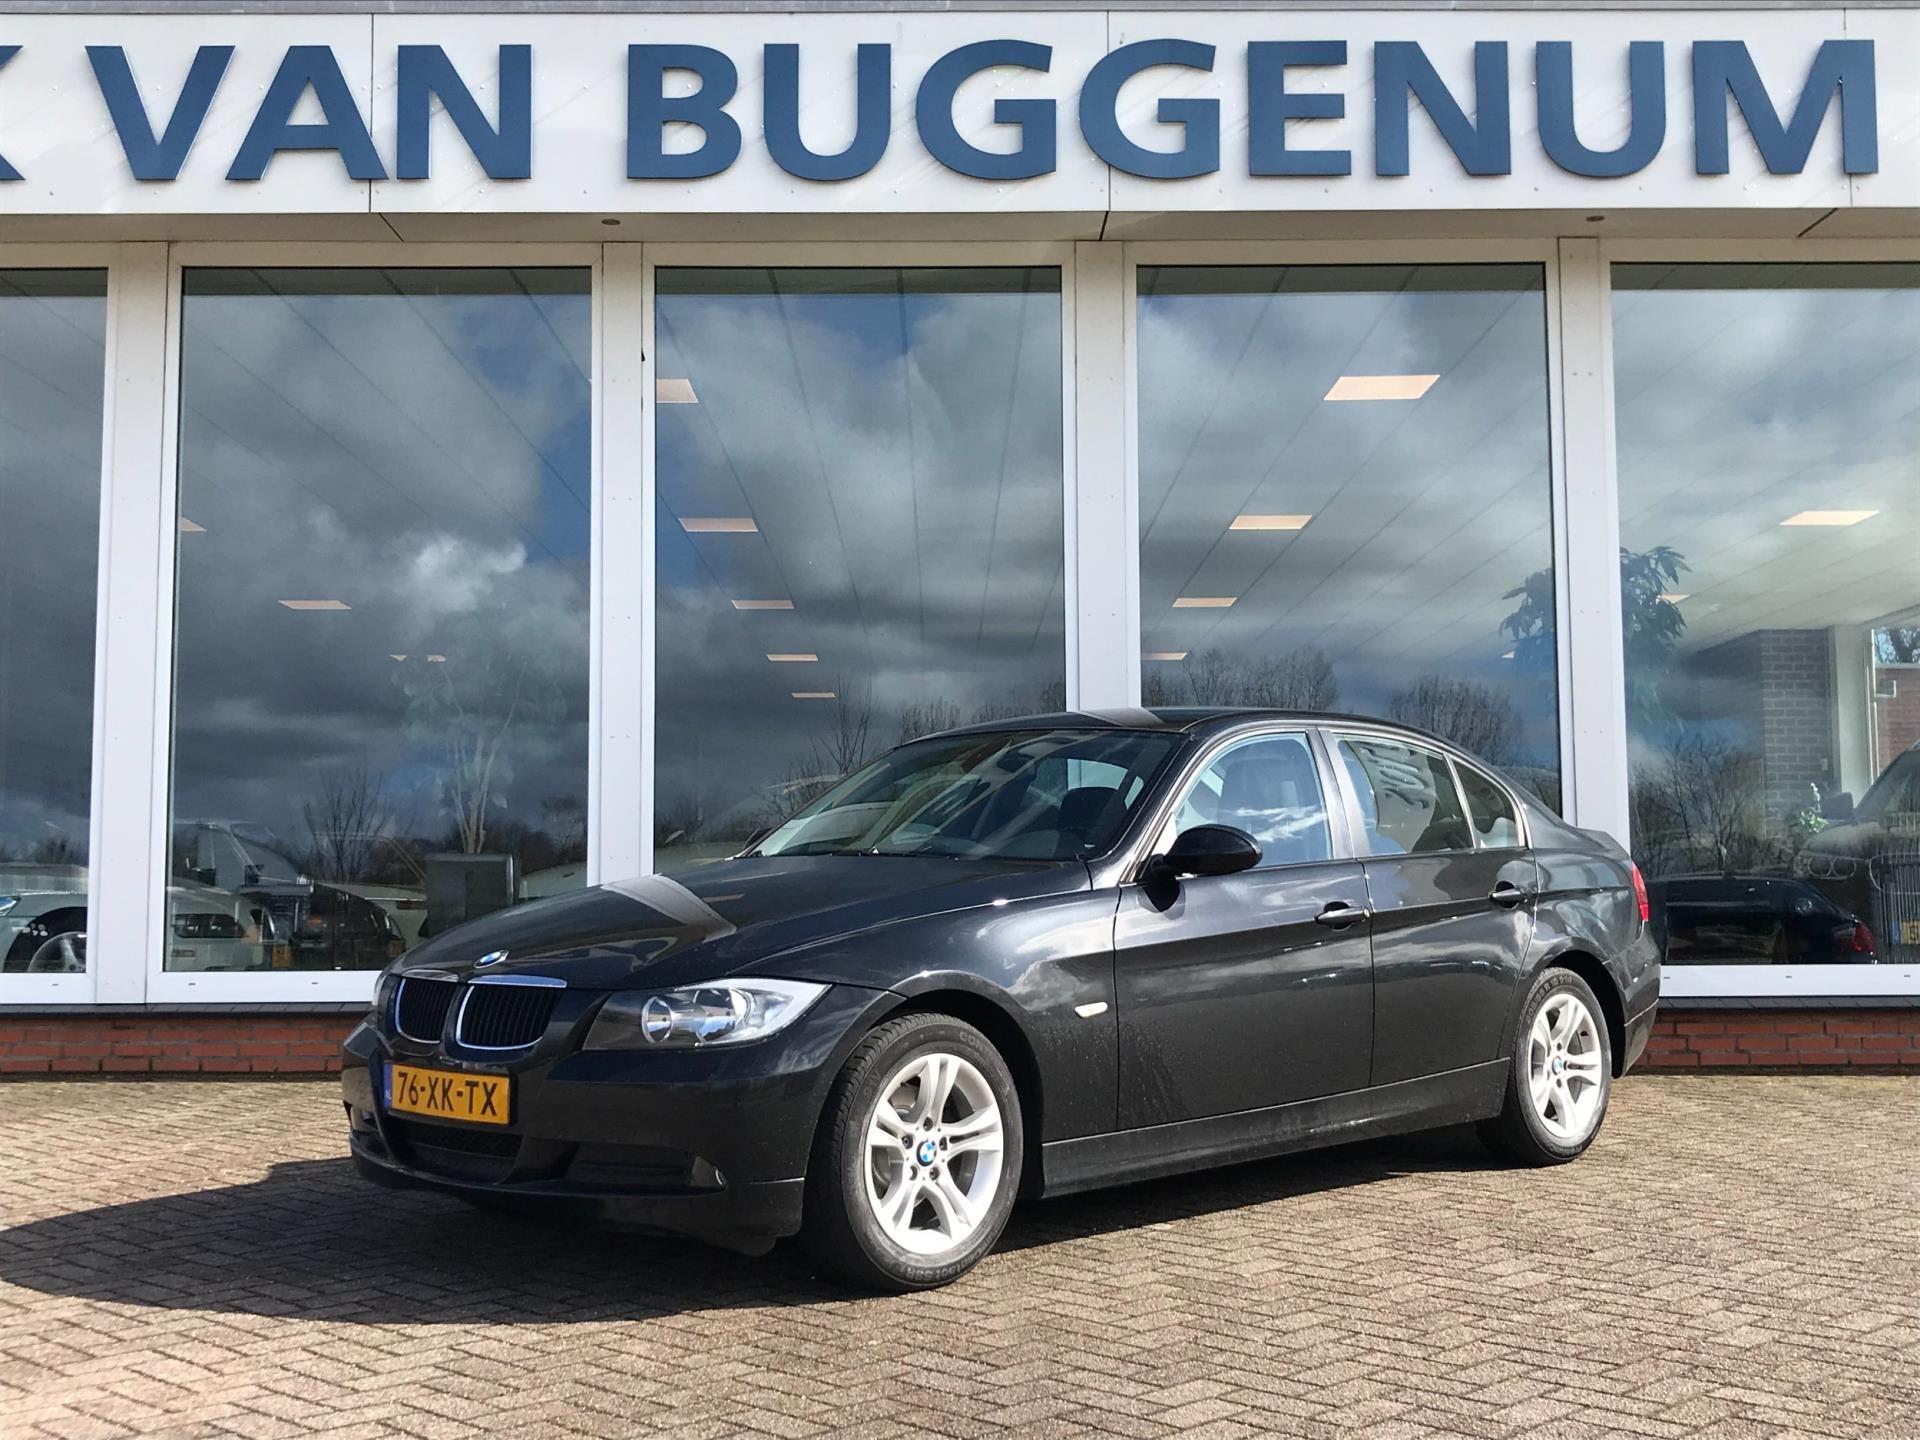 BMW 3-serie occasion - Automobielbedrijf J. van Buggenum